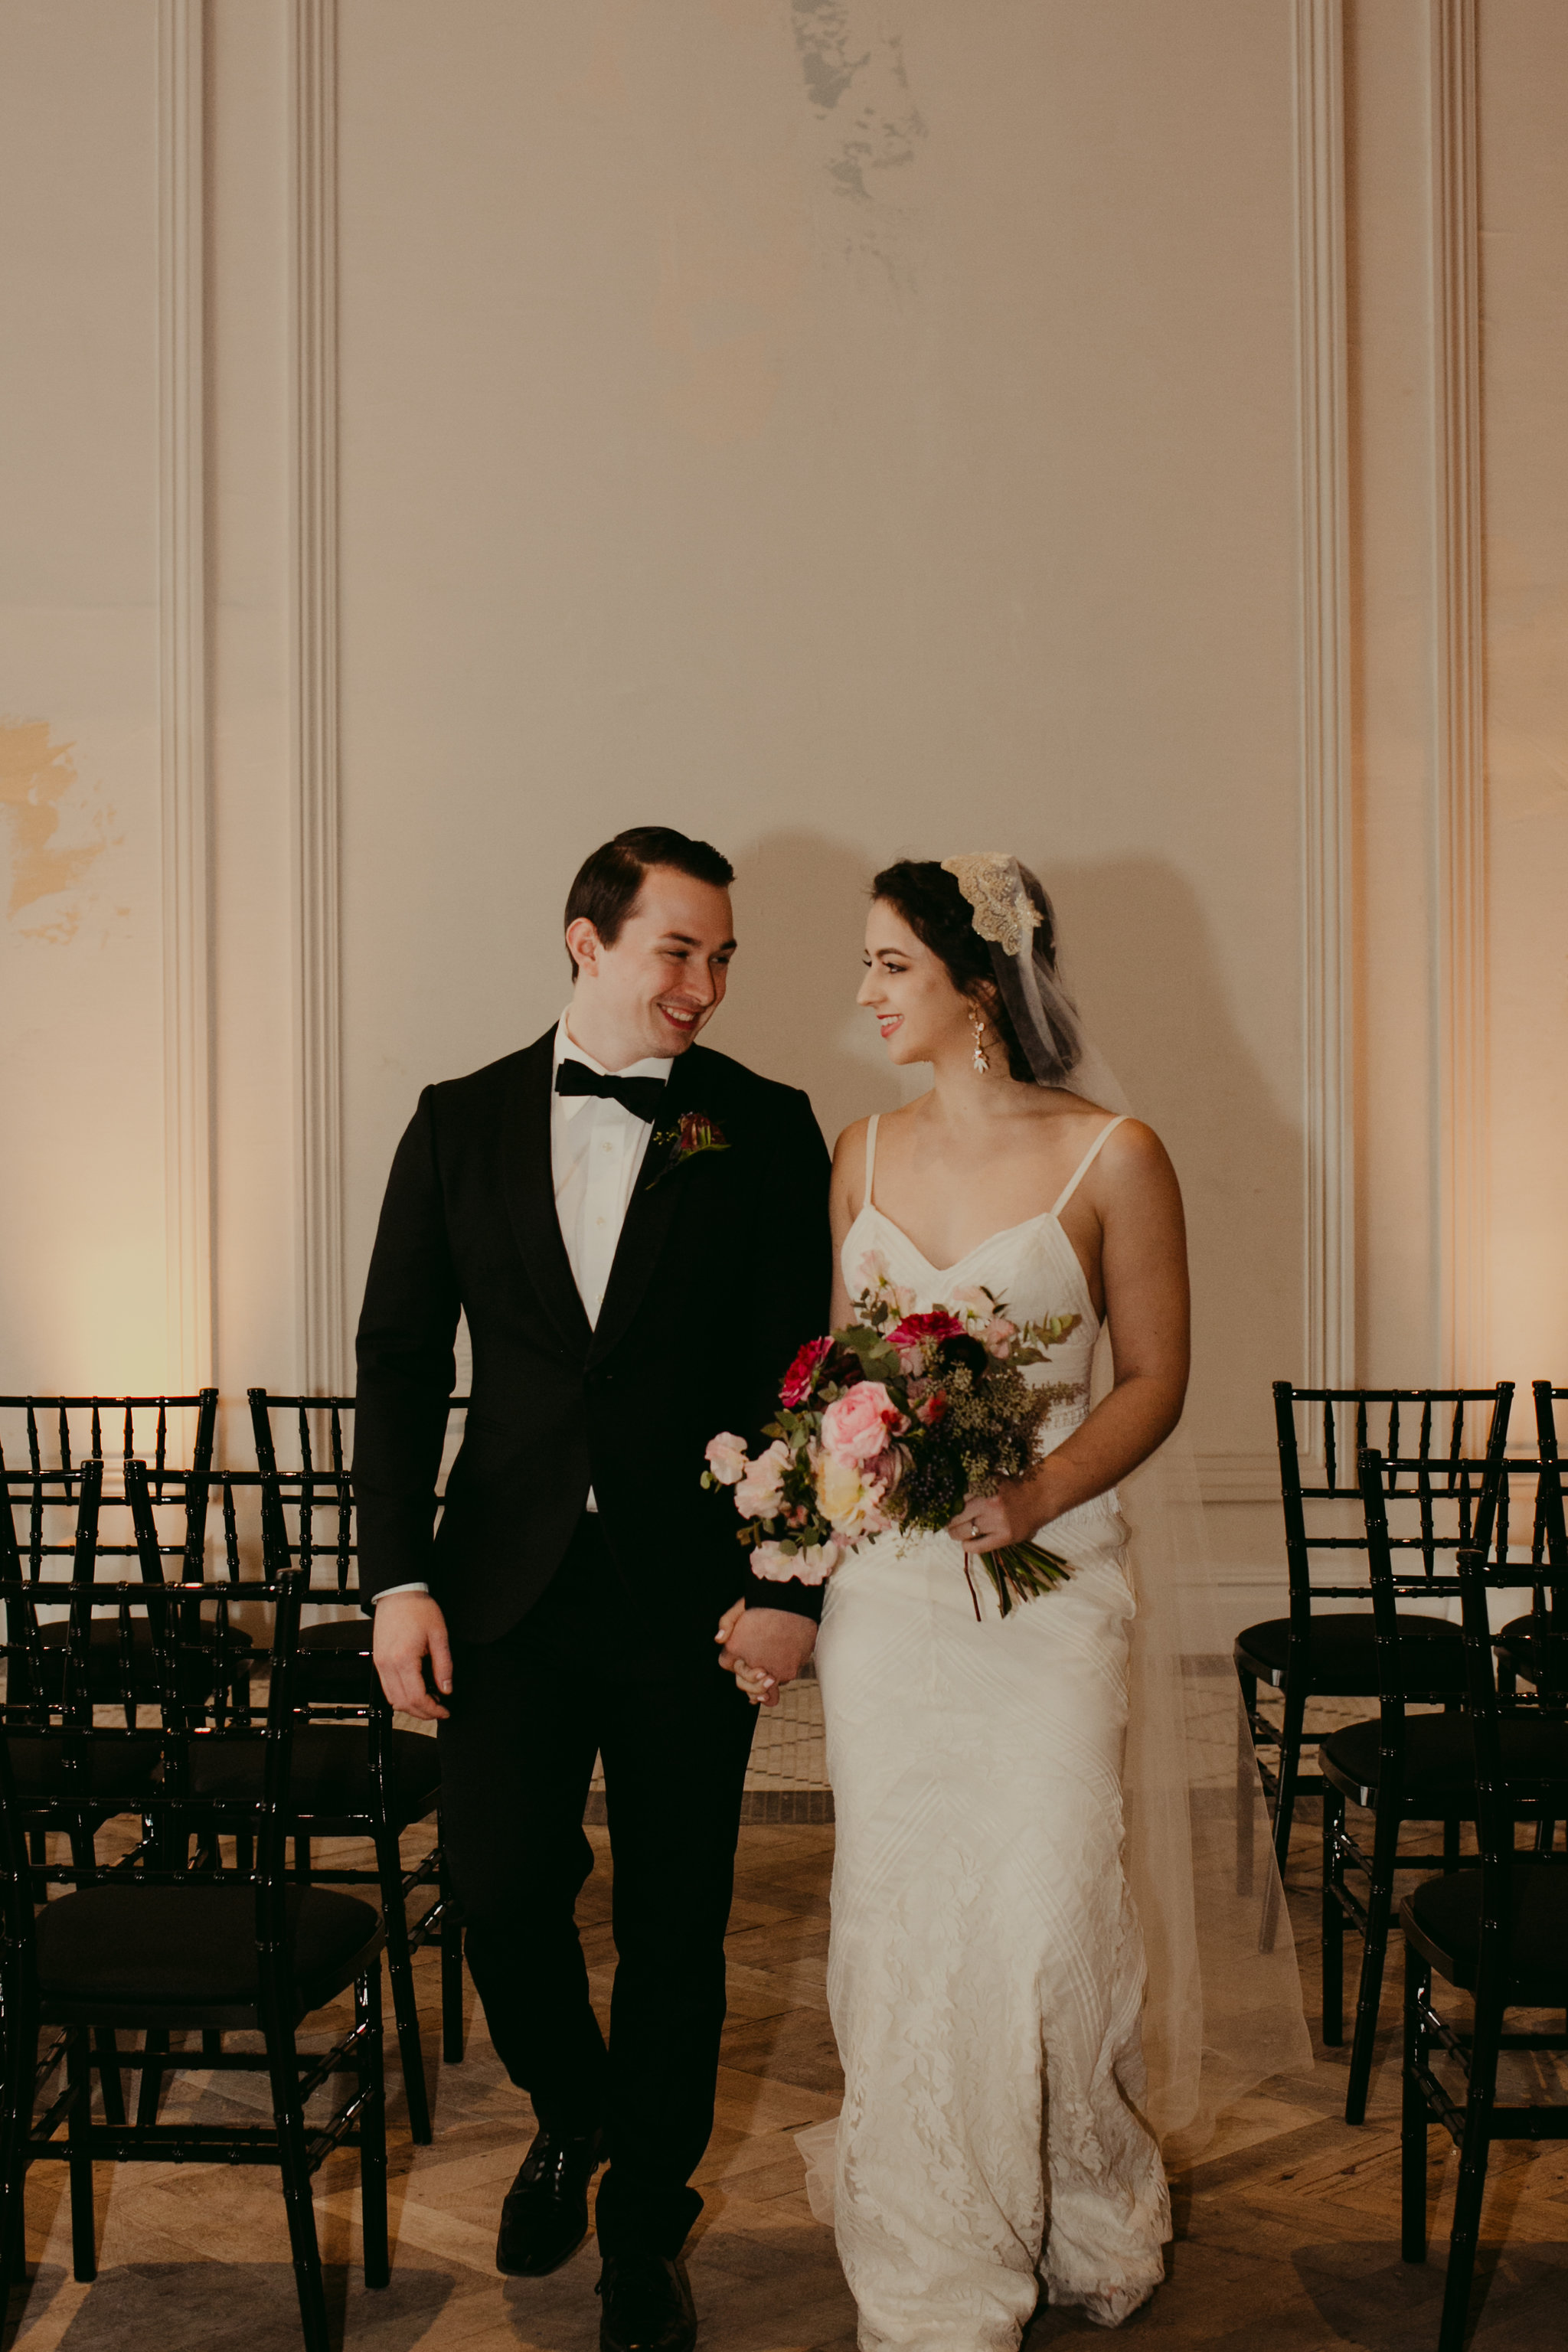 Williamsburg_Hotel_Wedding_Photographer_Chellise_Michael_Photography-274.jpg